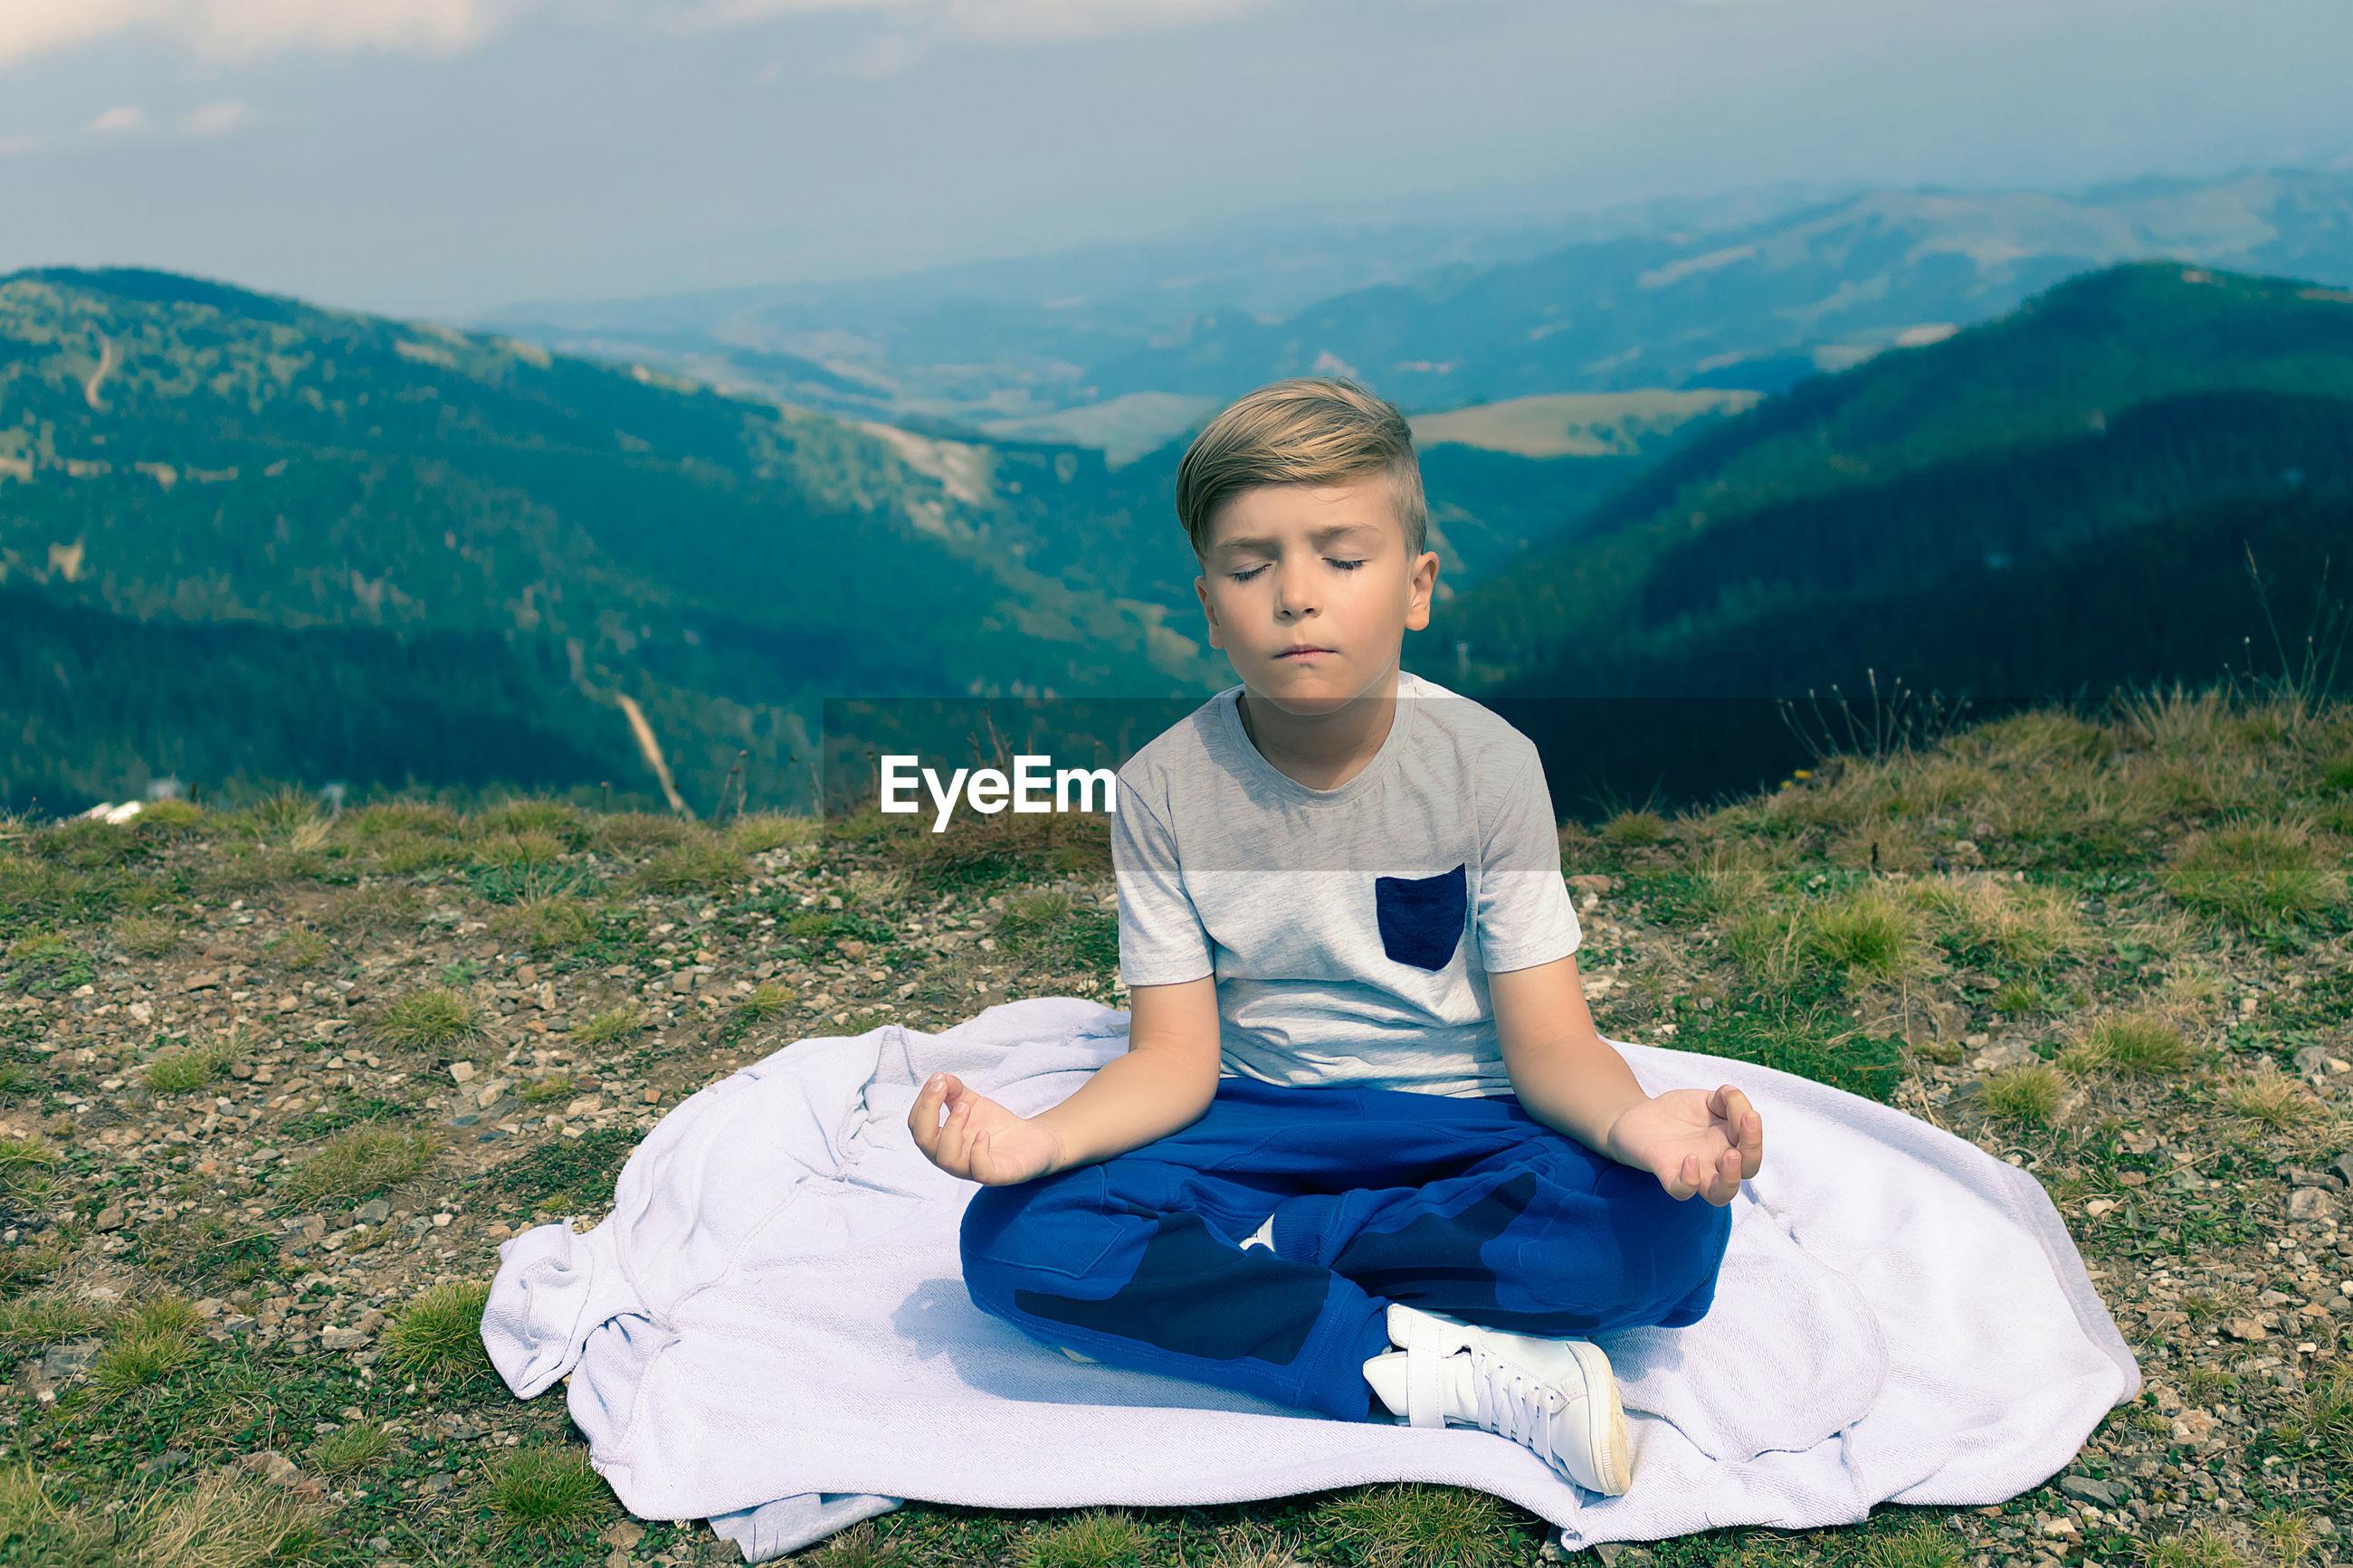 BOY SITTING ON FIELD AGAINST MOUNTAIN